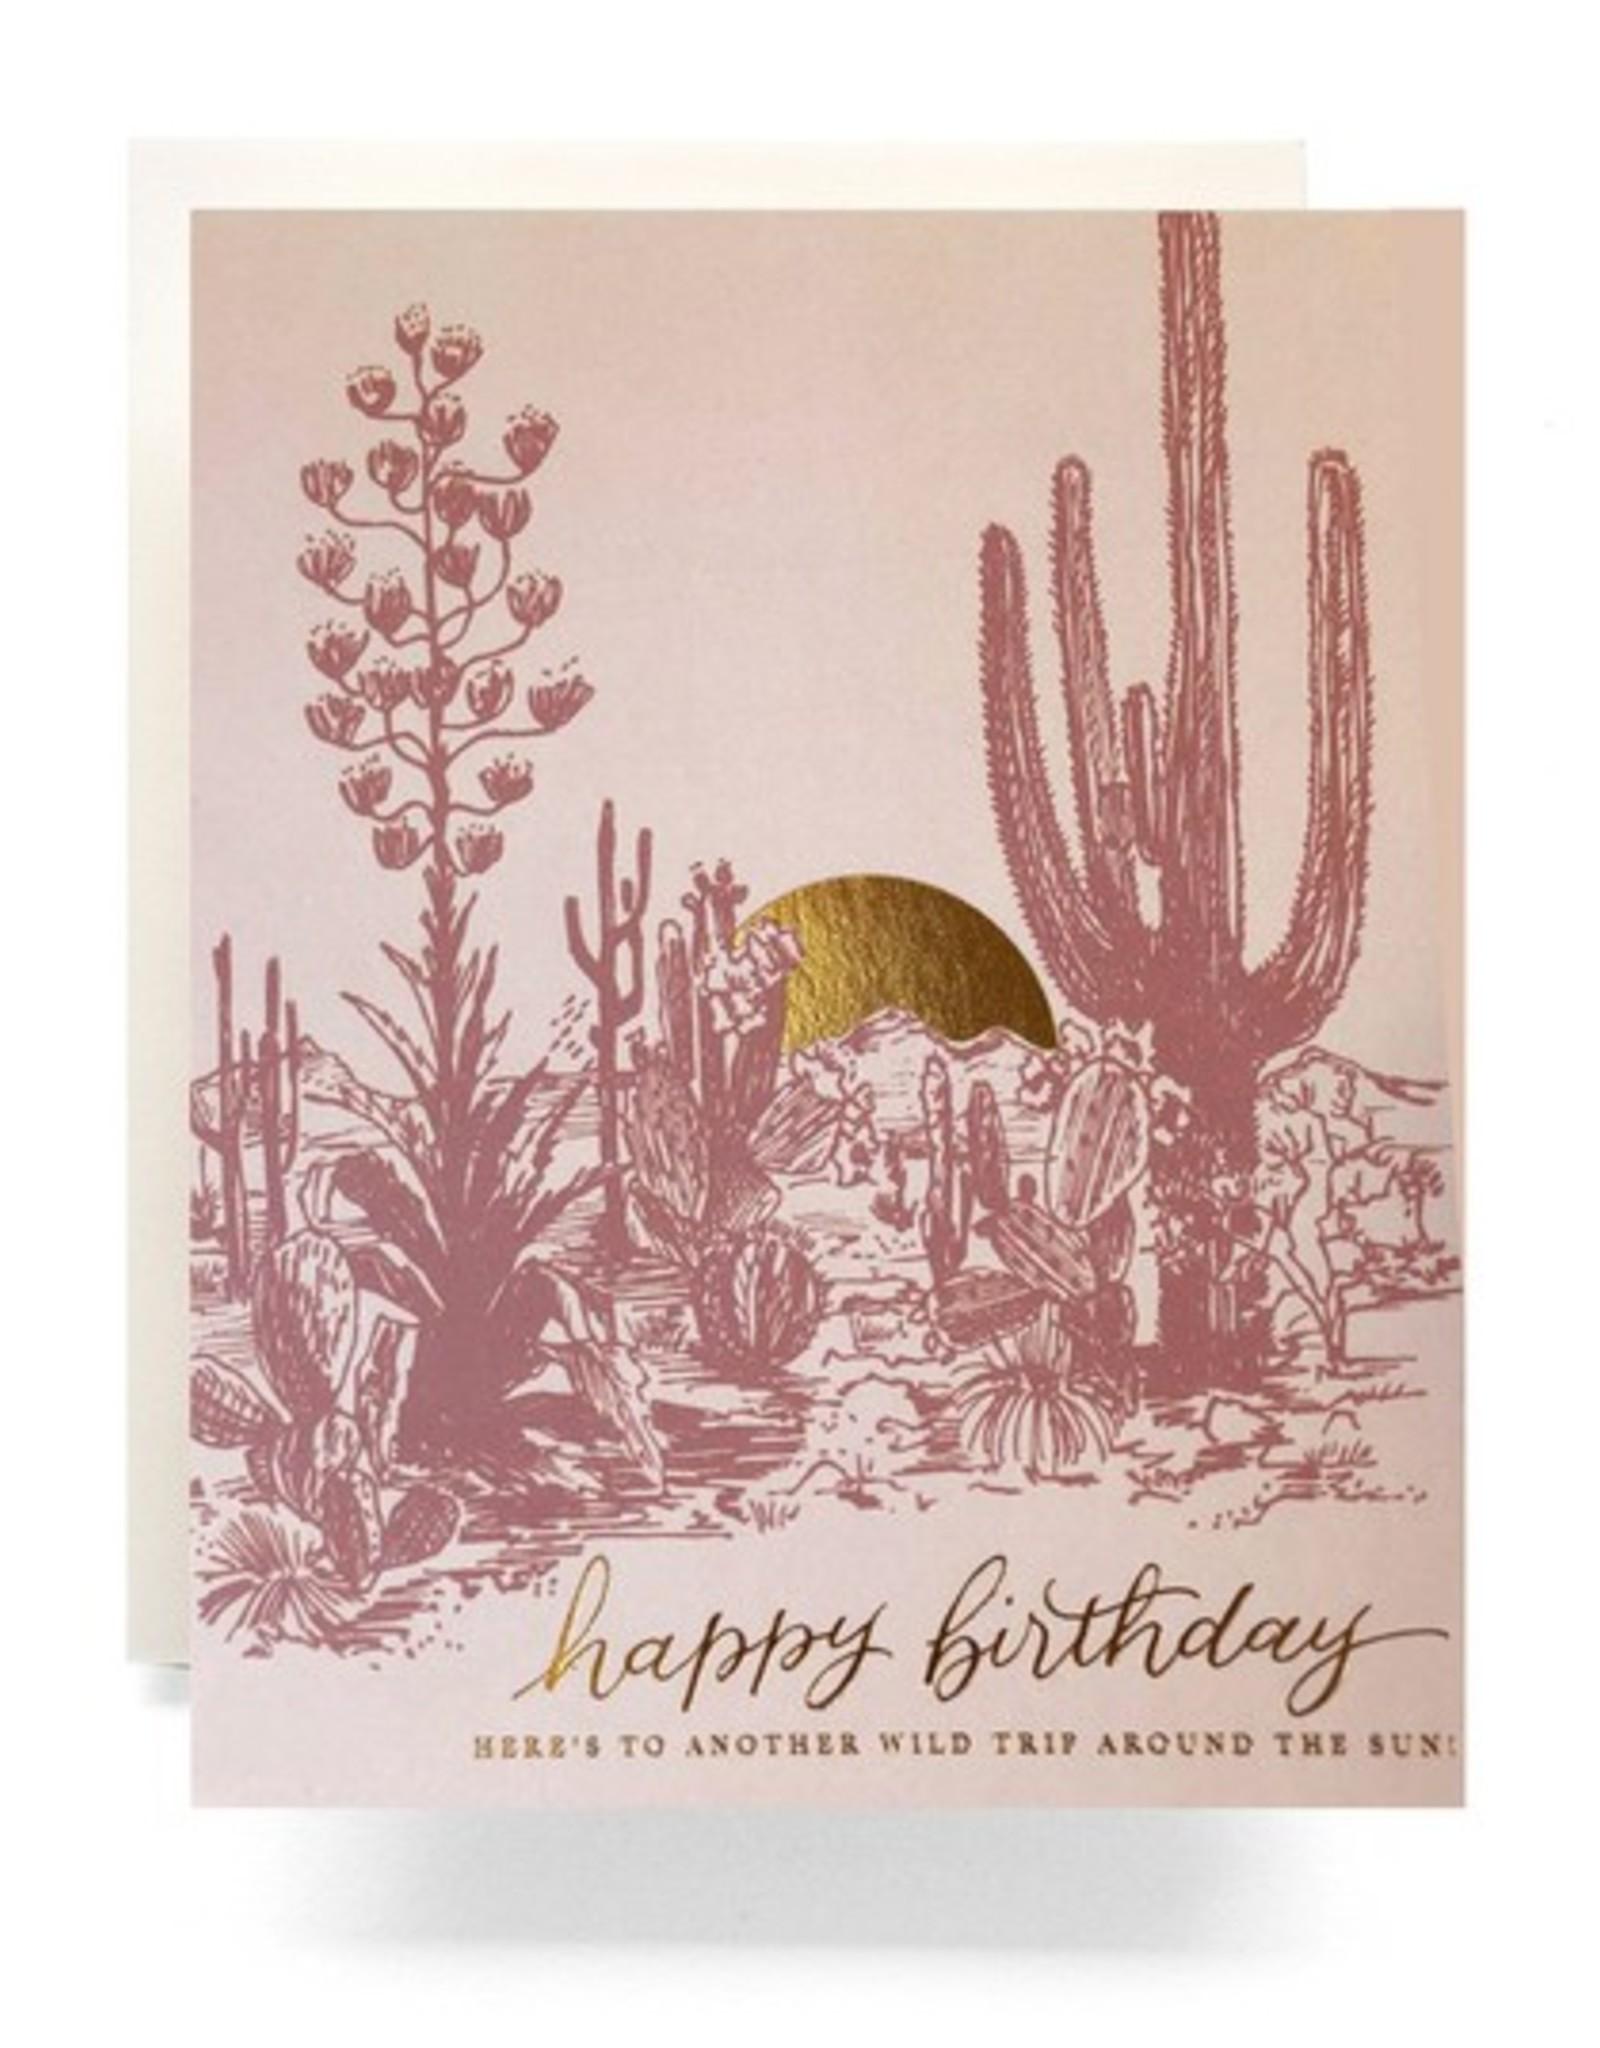 Cactus Sunset Birthday Card